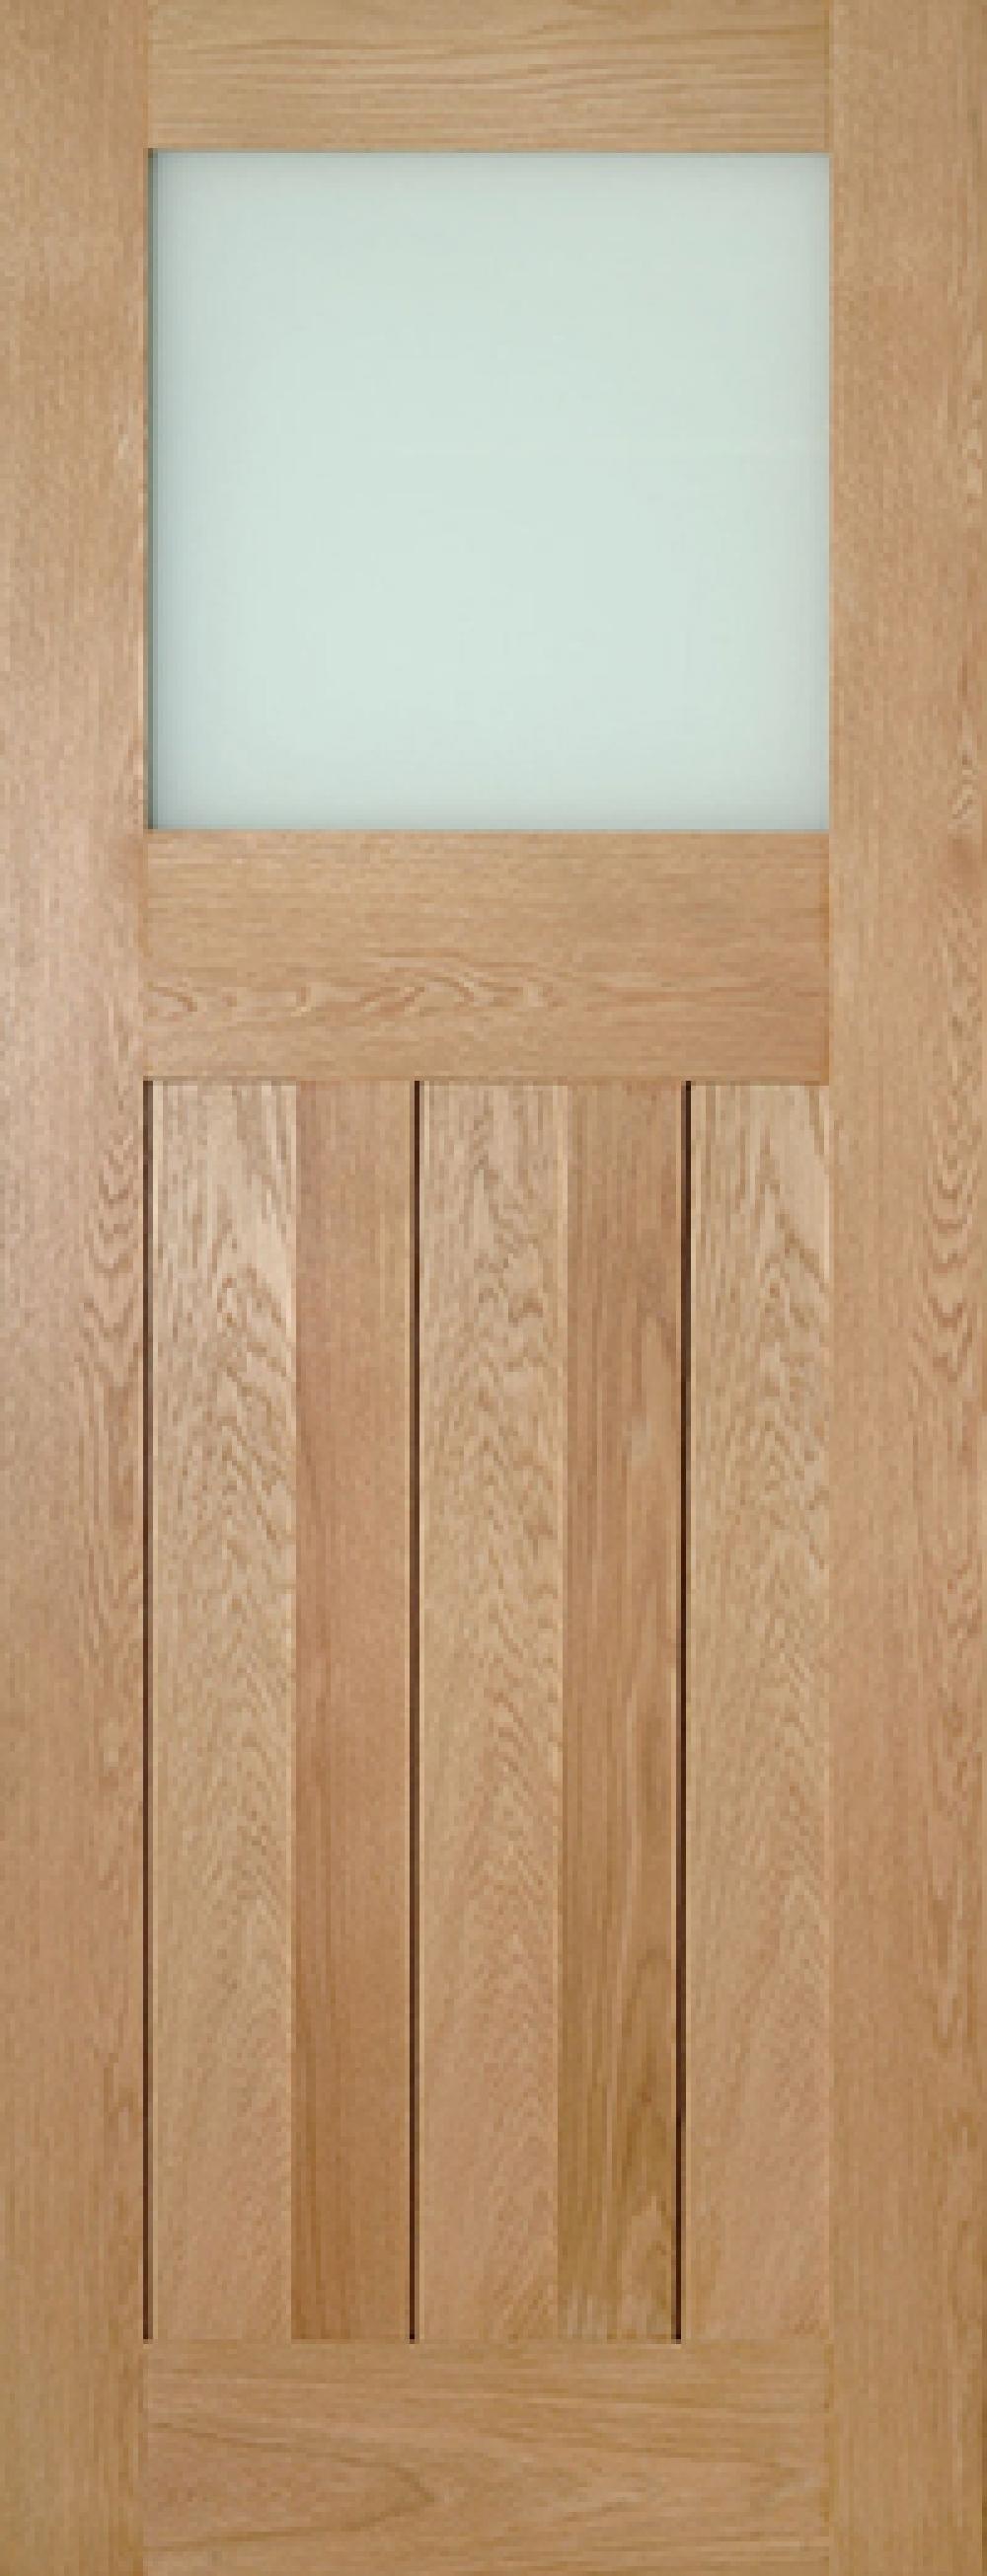 Cambridge Glazed Oak Door - Frosted Glass